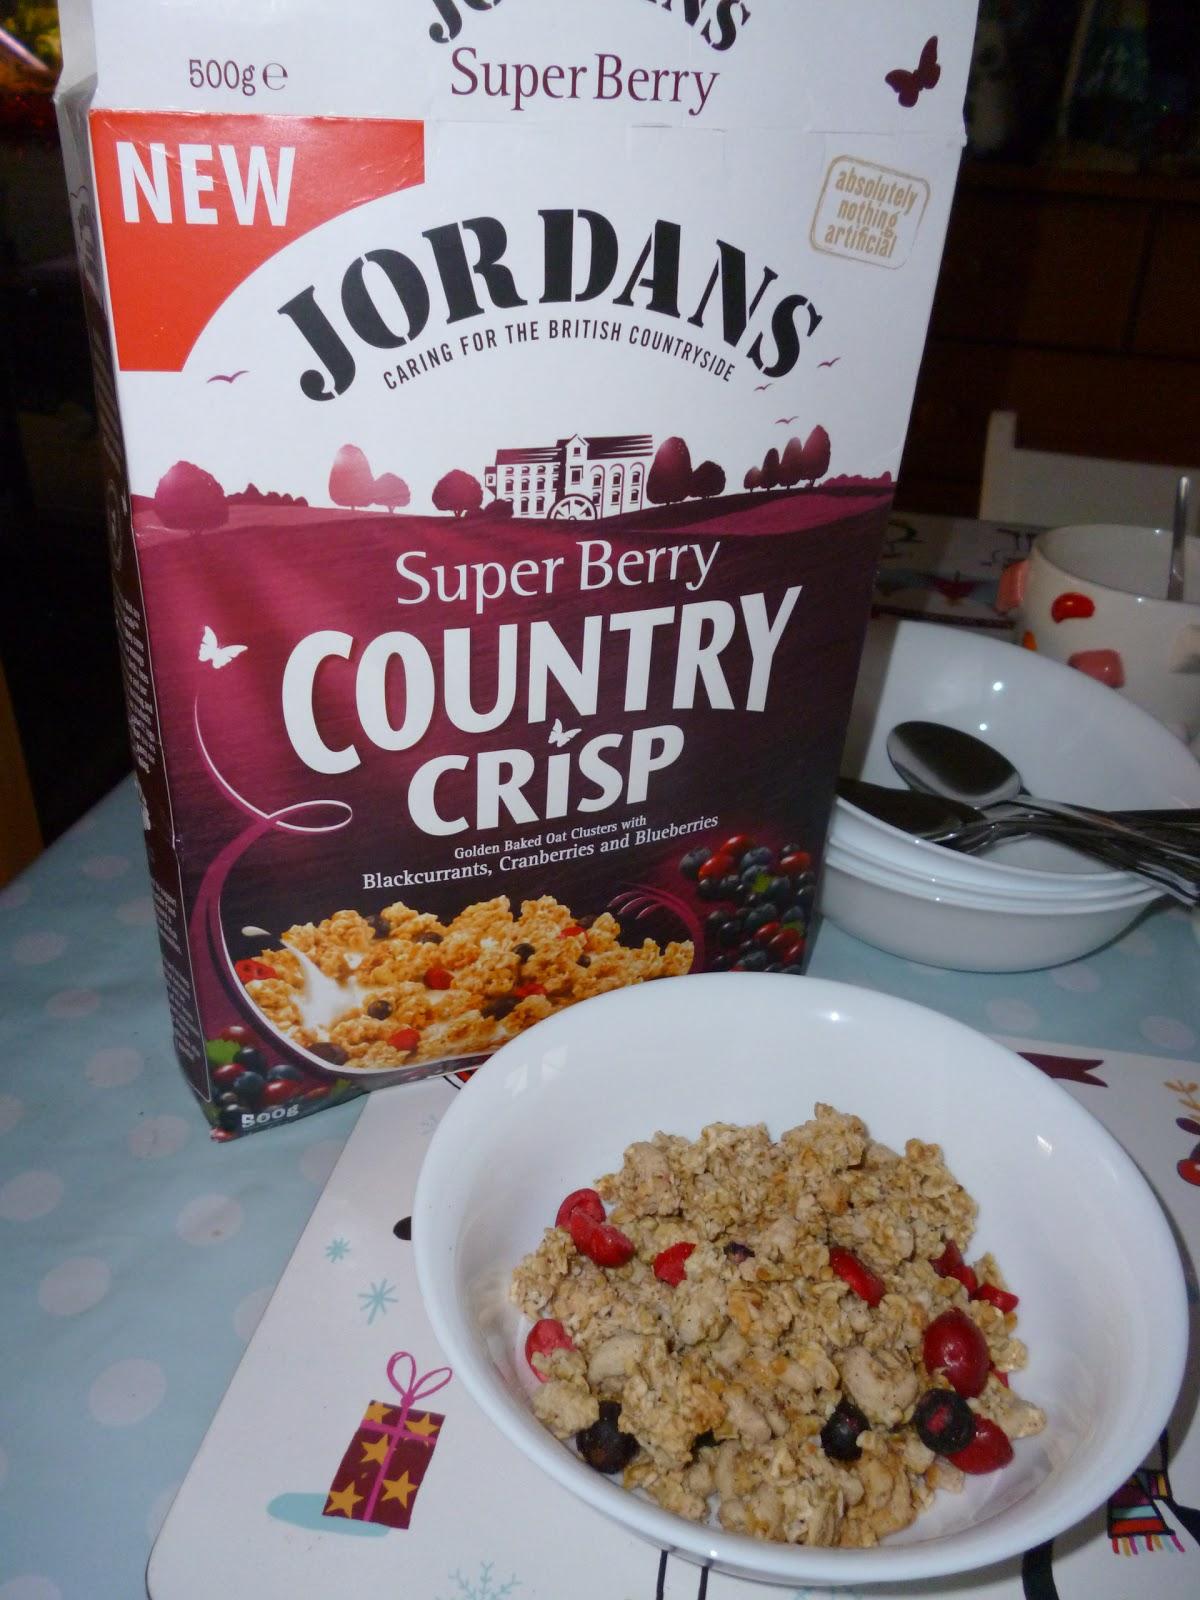 Madhouse Family Reviews: Jordans Super Berry Country Crisp review